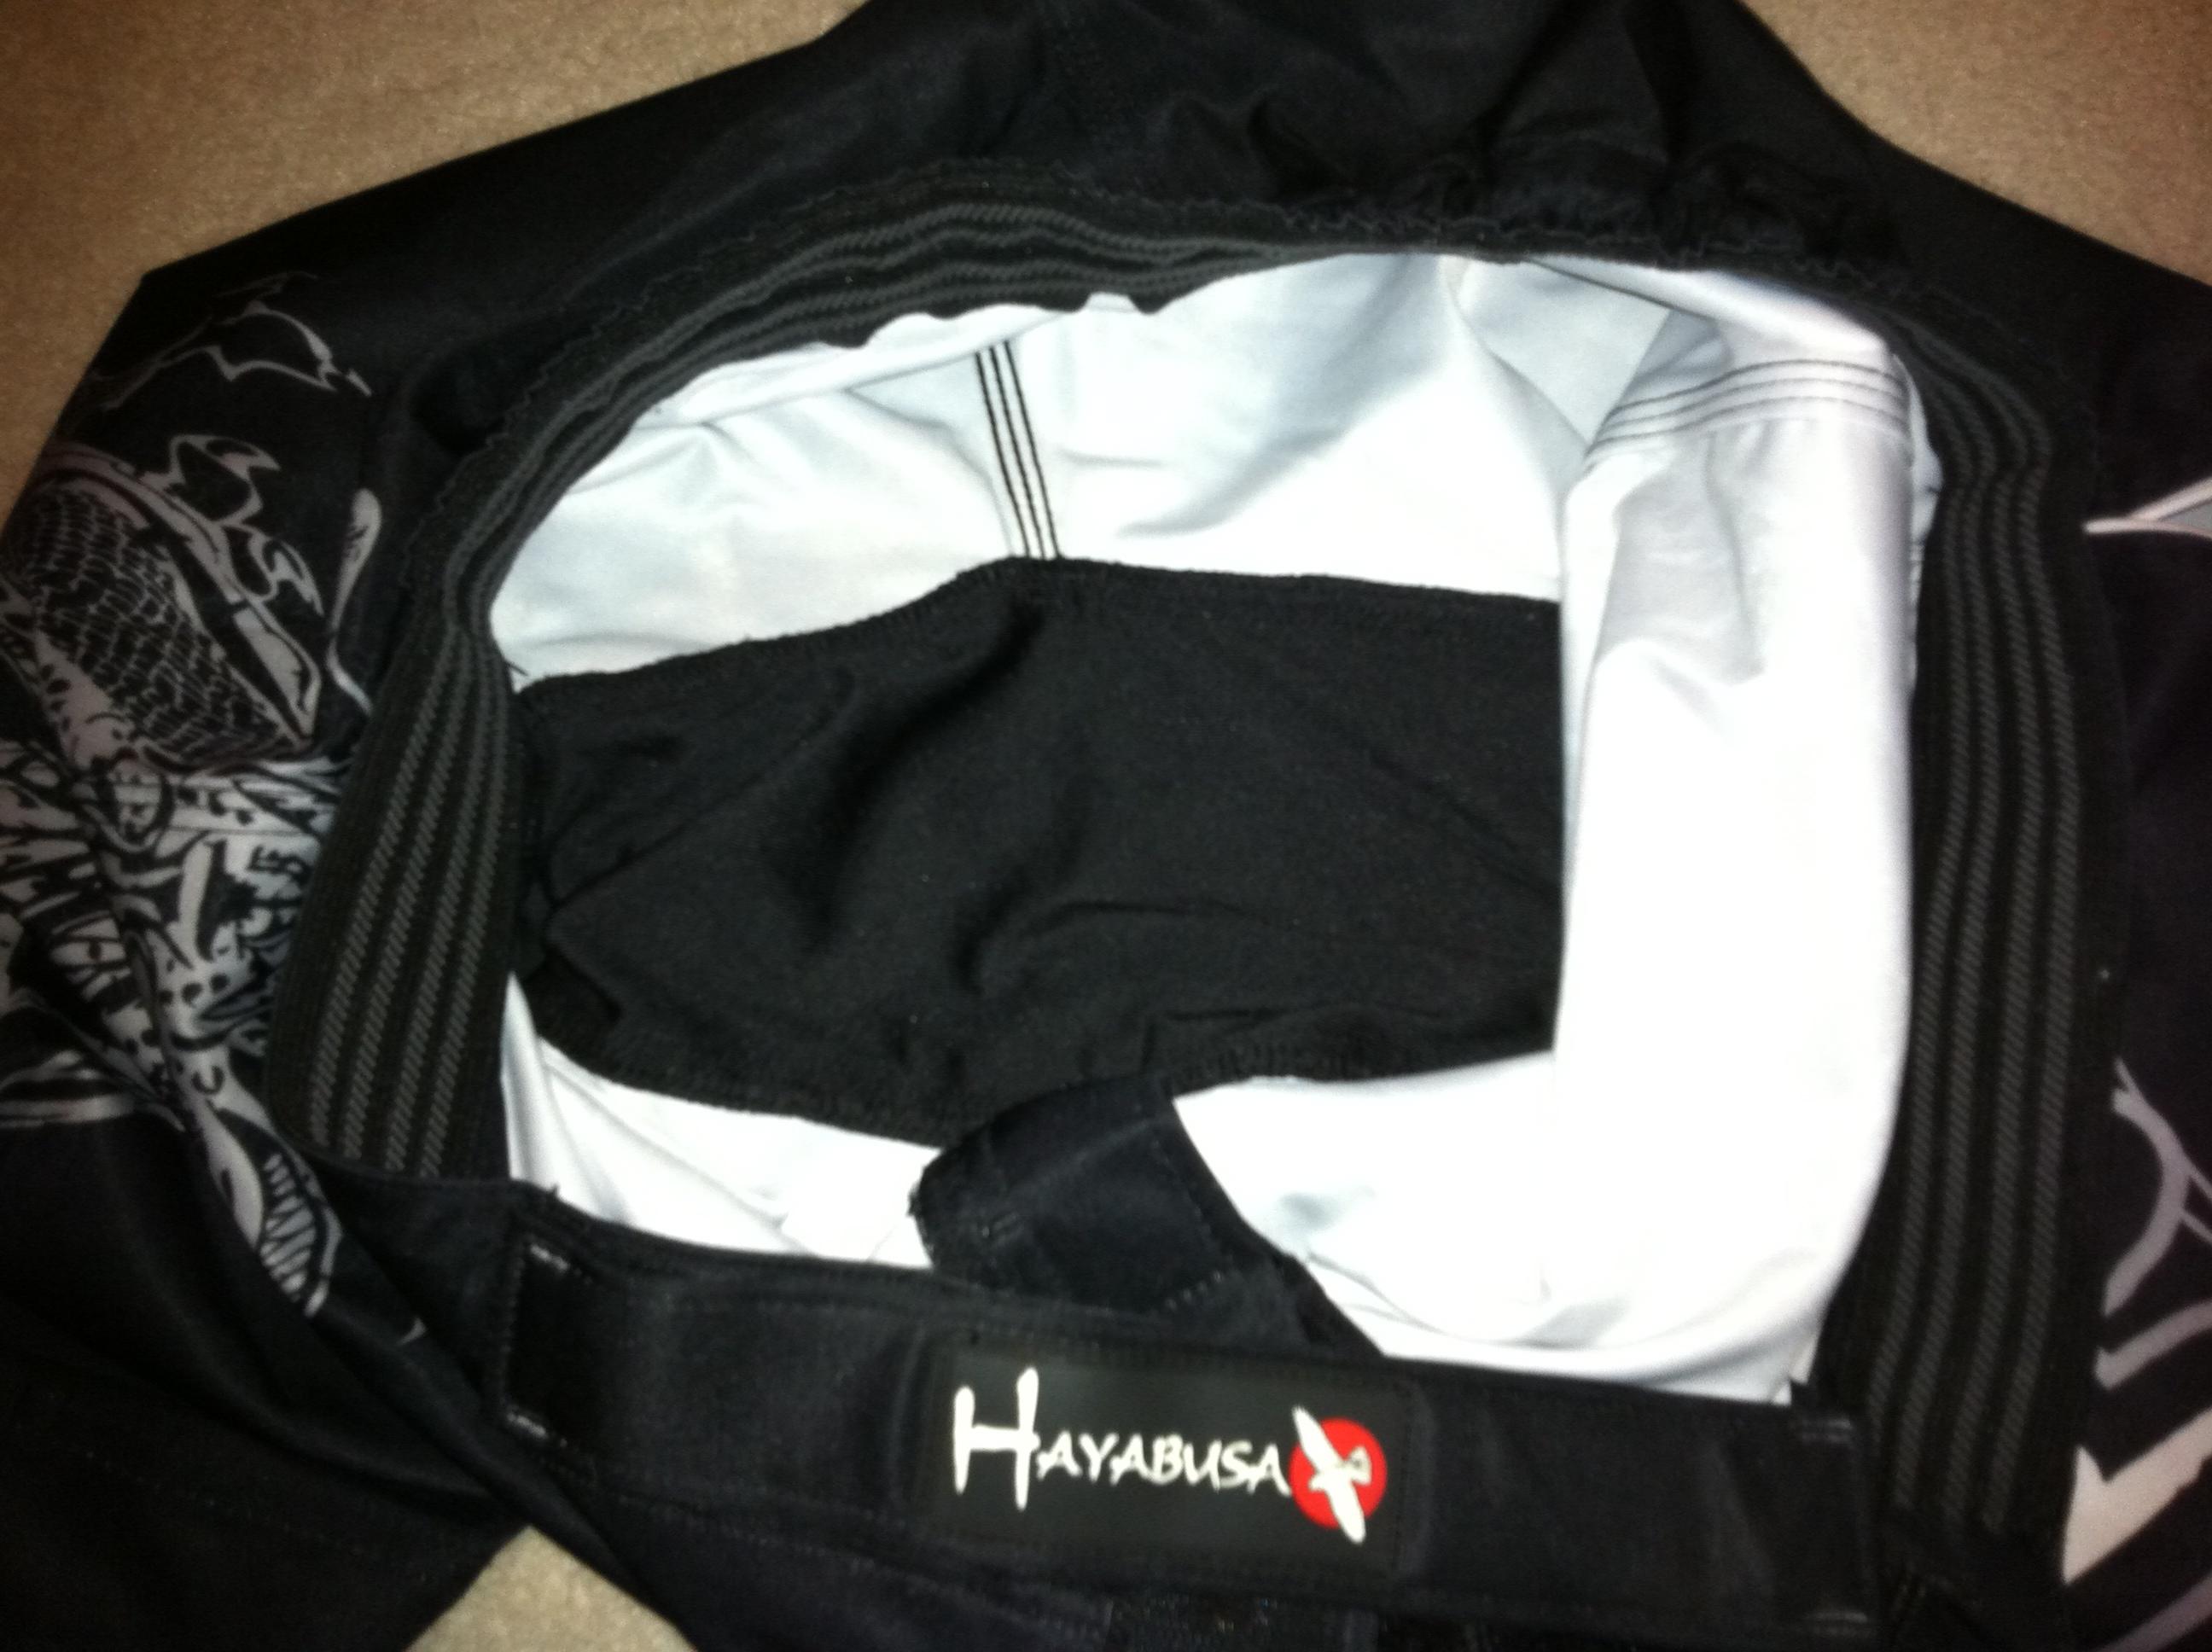 Product Review: HAYABUSA Mizuchi Fight Shorts - STRONG